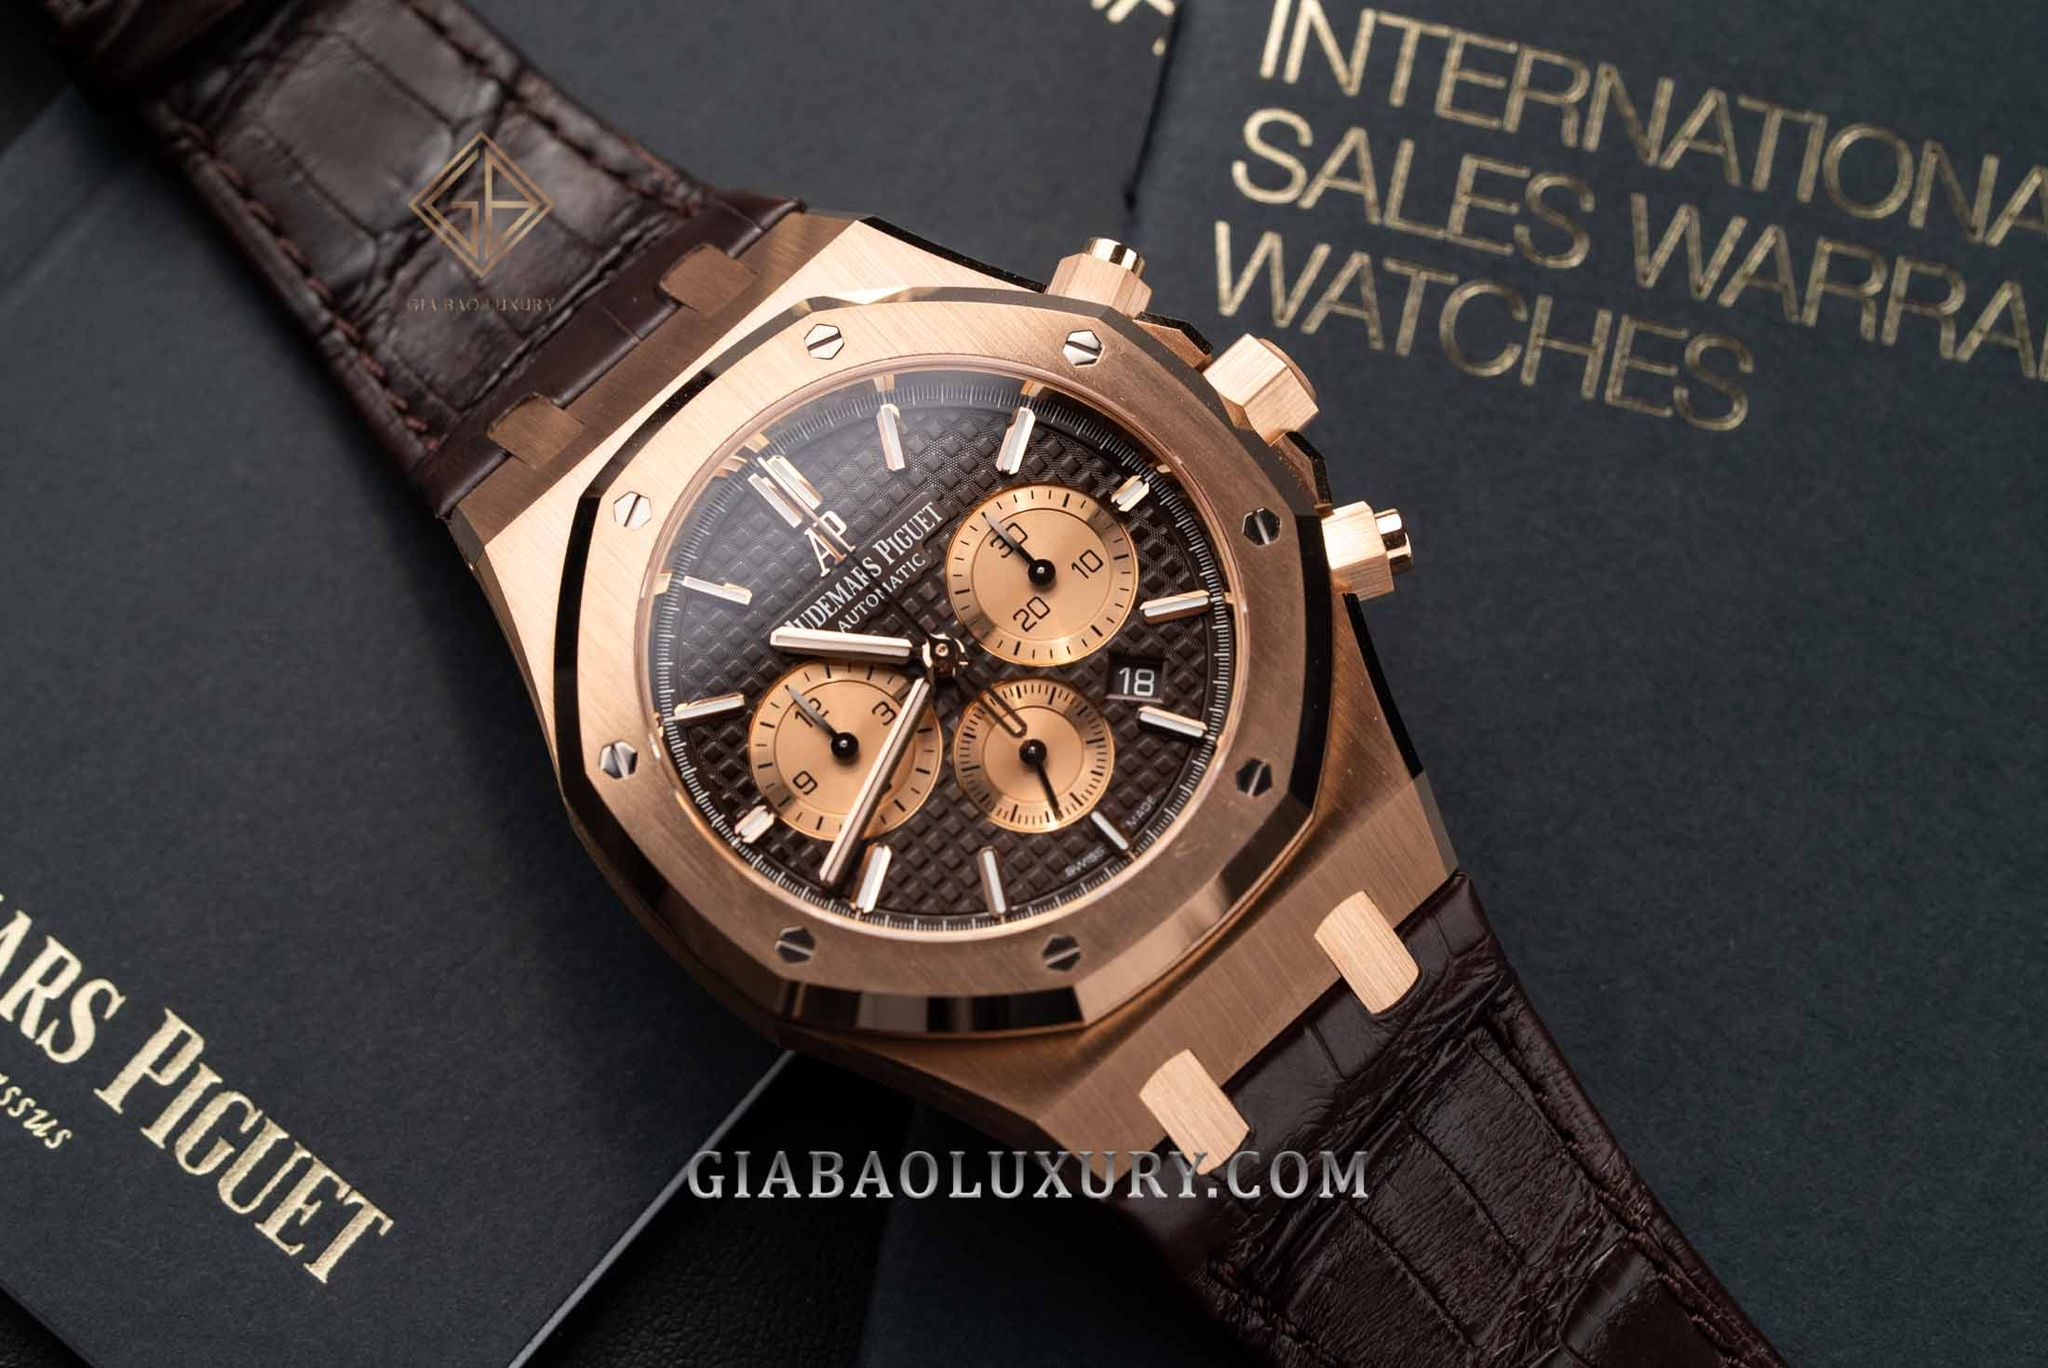 Audemars Piguet Royal Oak Chronograph mã hiệu 26331OR.OO.D821CR.01